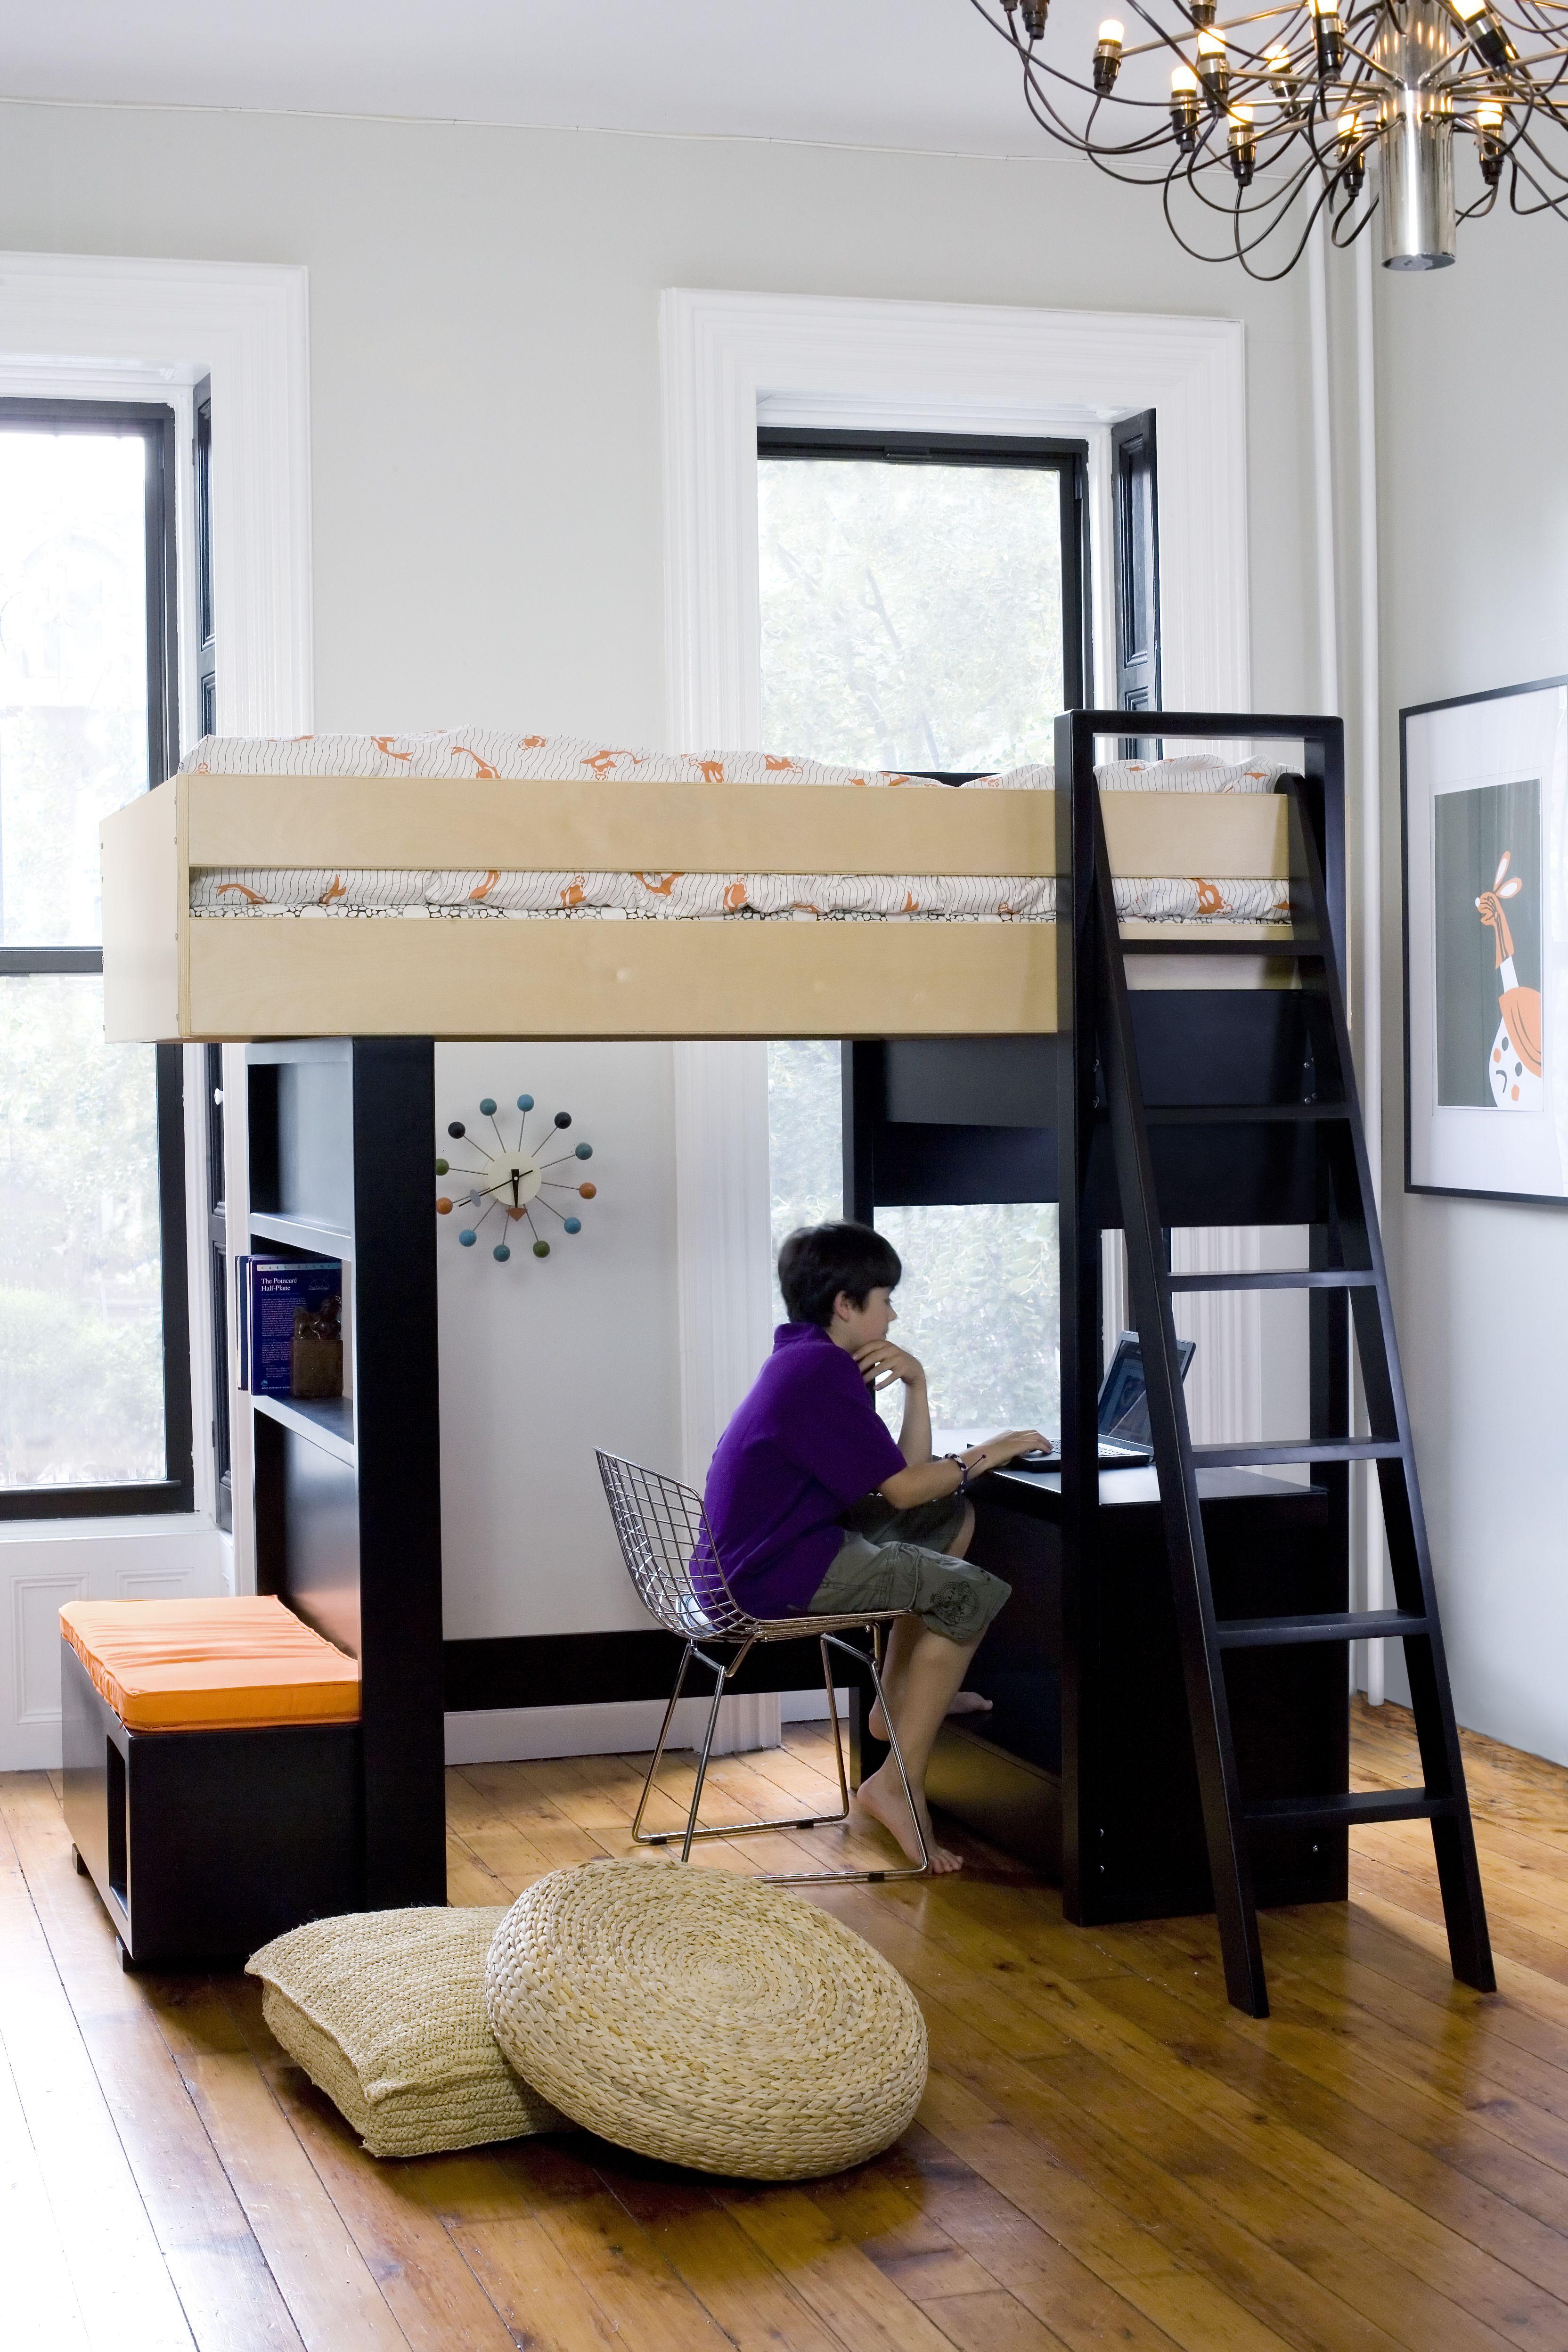 Argington Uffizi Bunk Bed And Fuji Toy Box Used As A Desk Kids